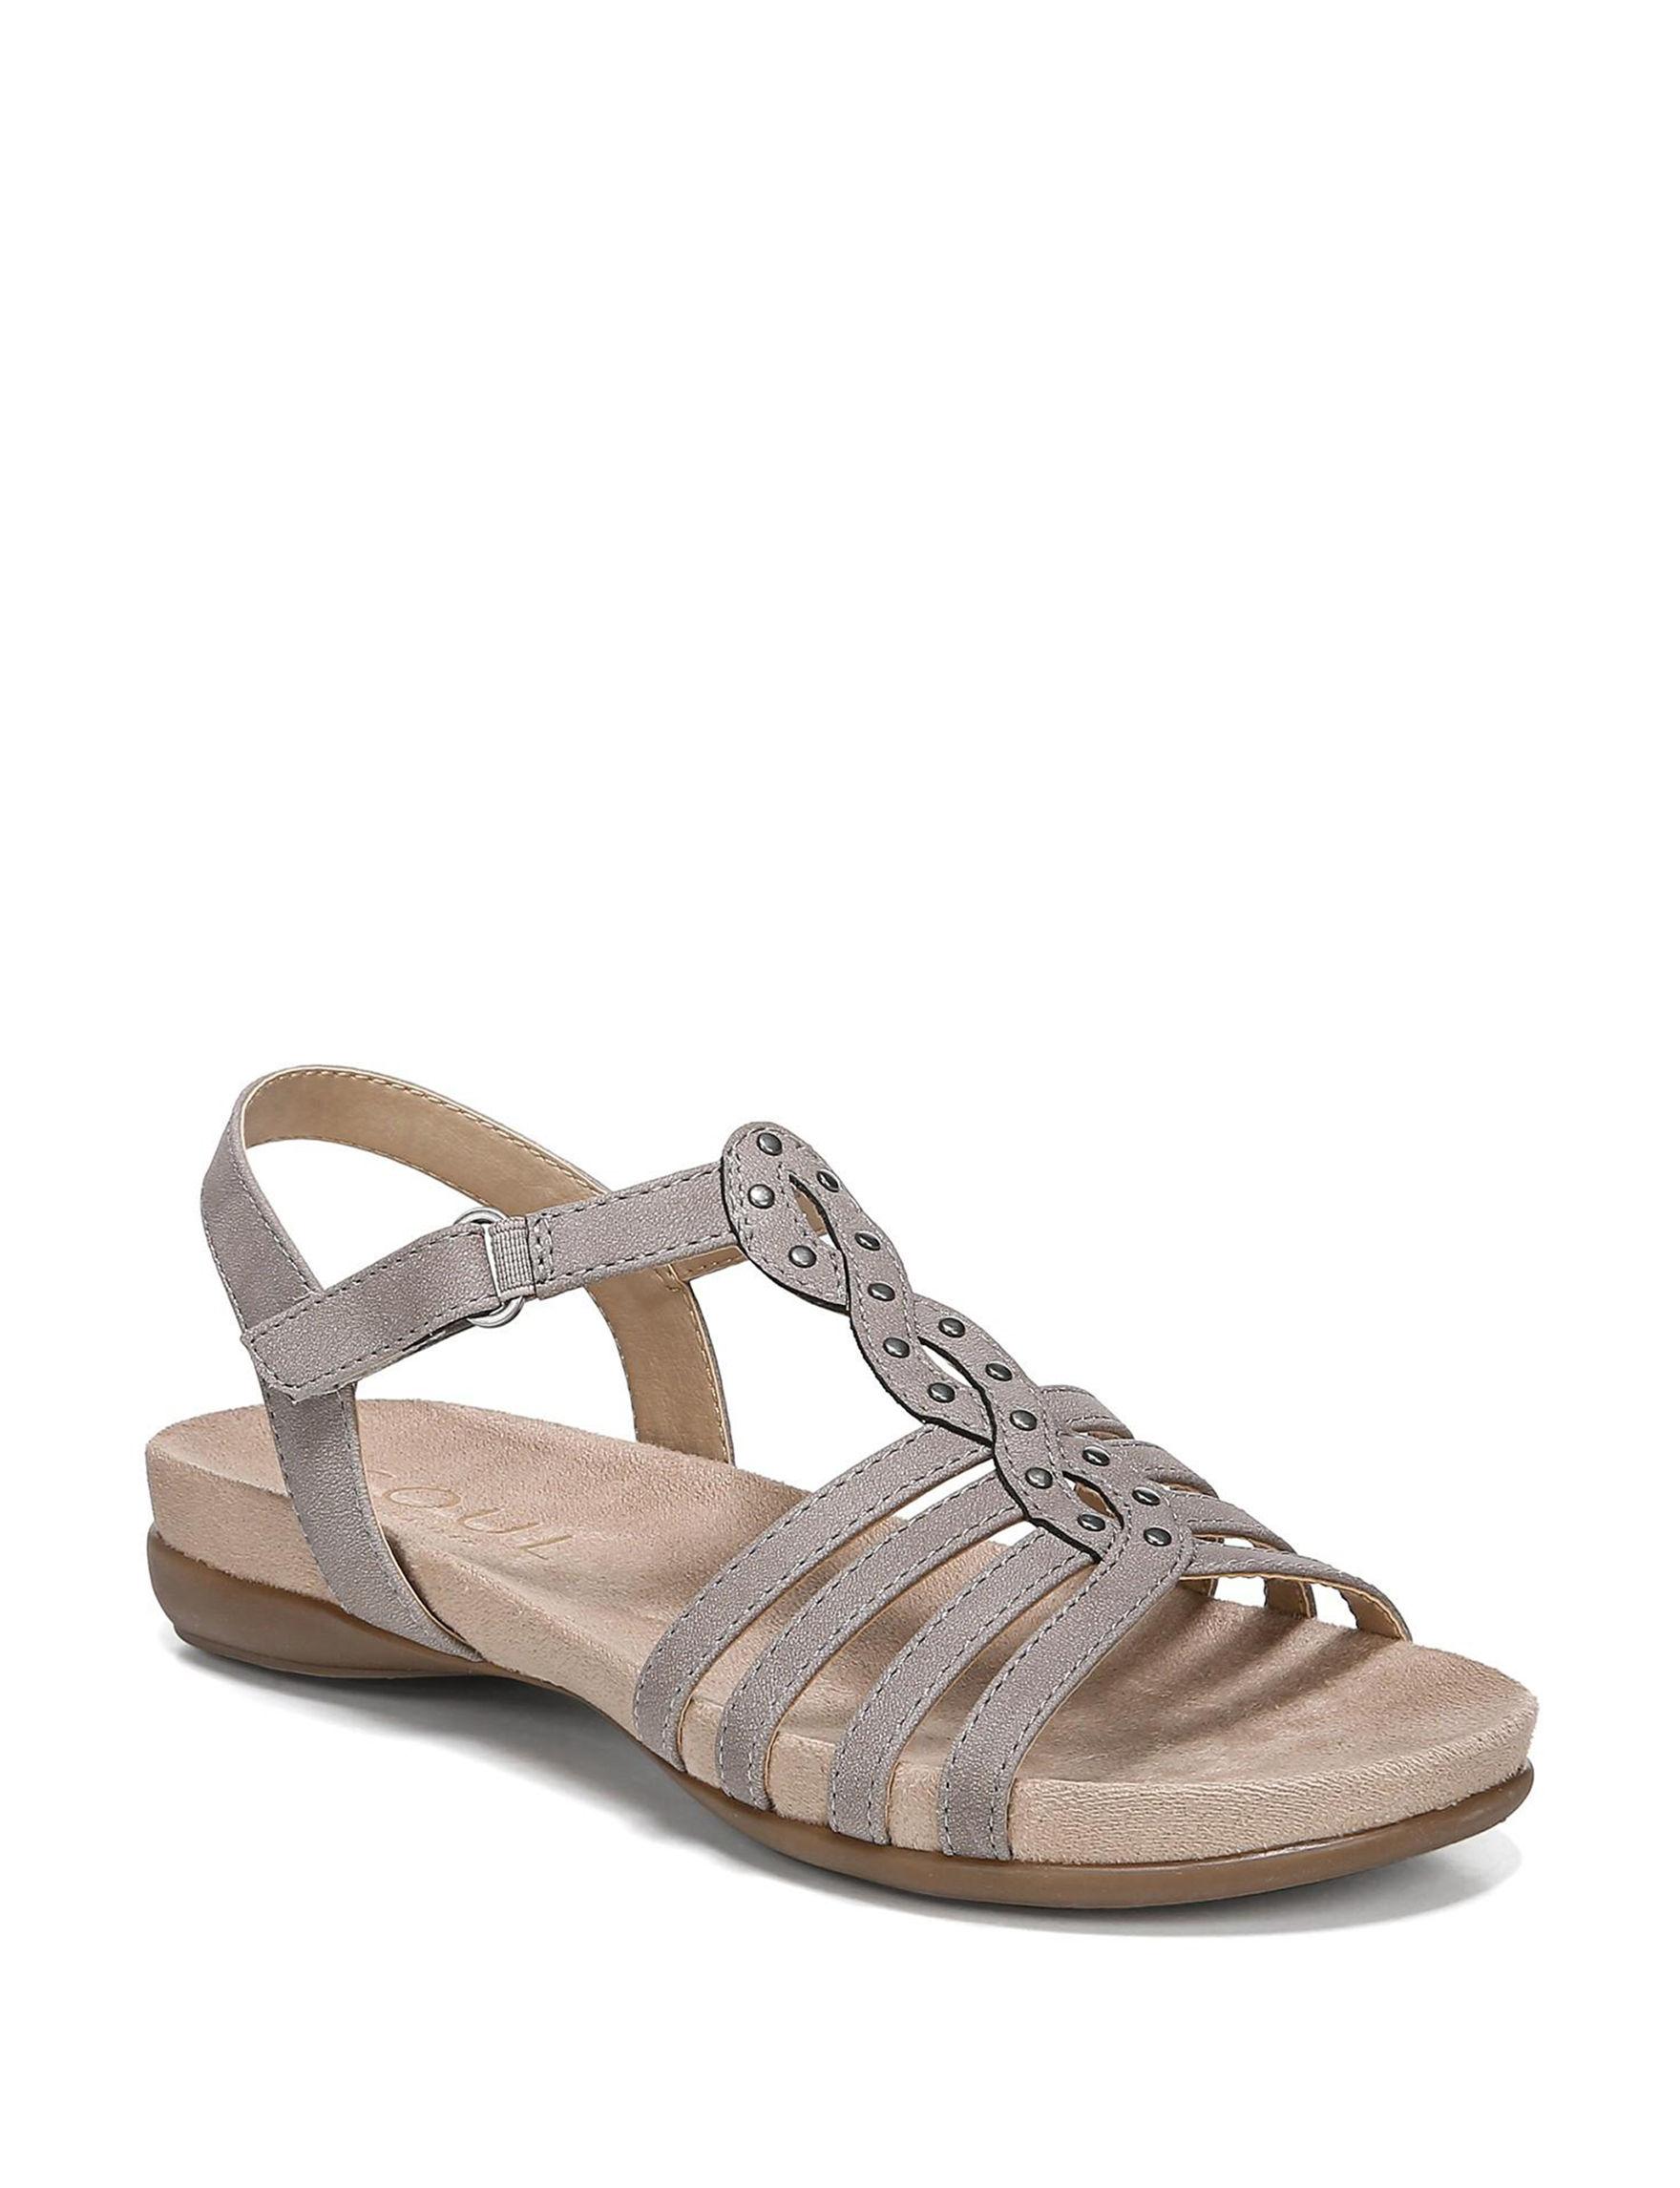 Soul Naturalizer Mushroom Flat Sandals